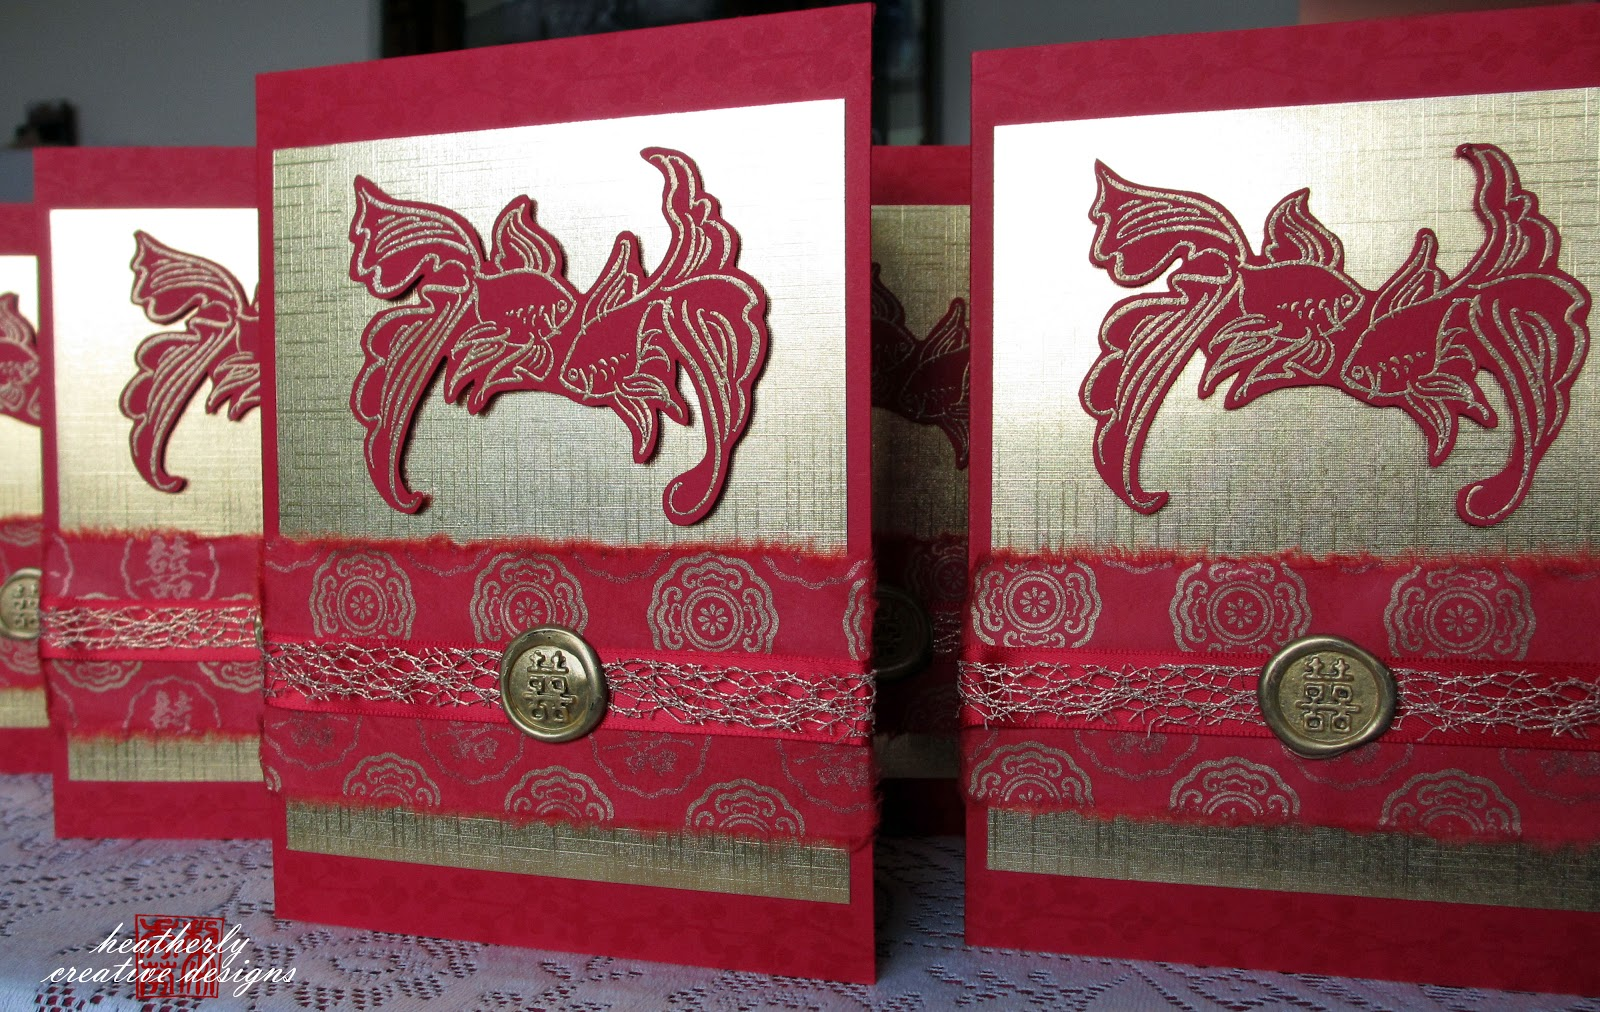 Chinese Wedding Invitations | heatherly creative designs